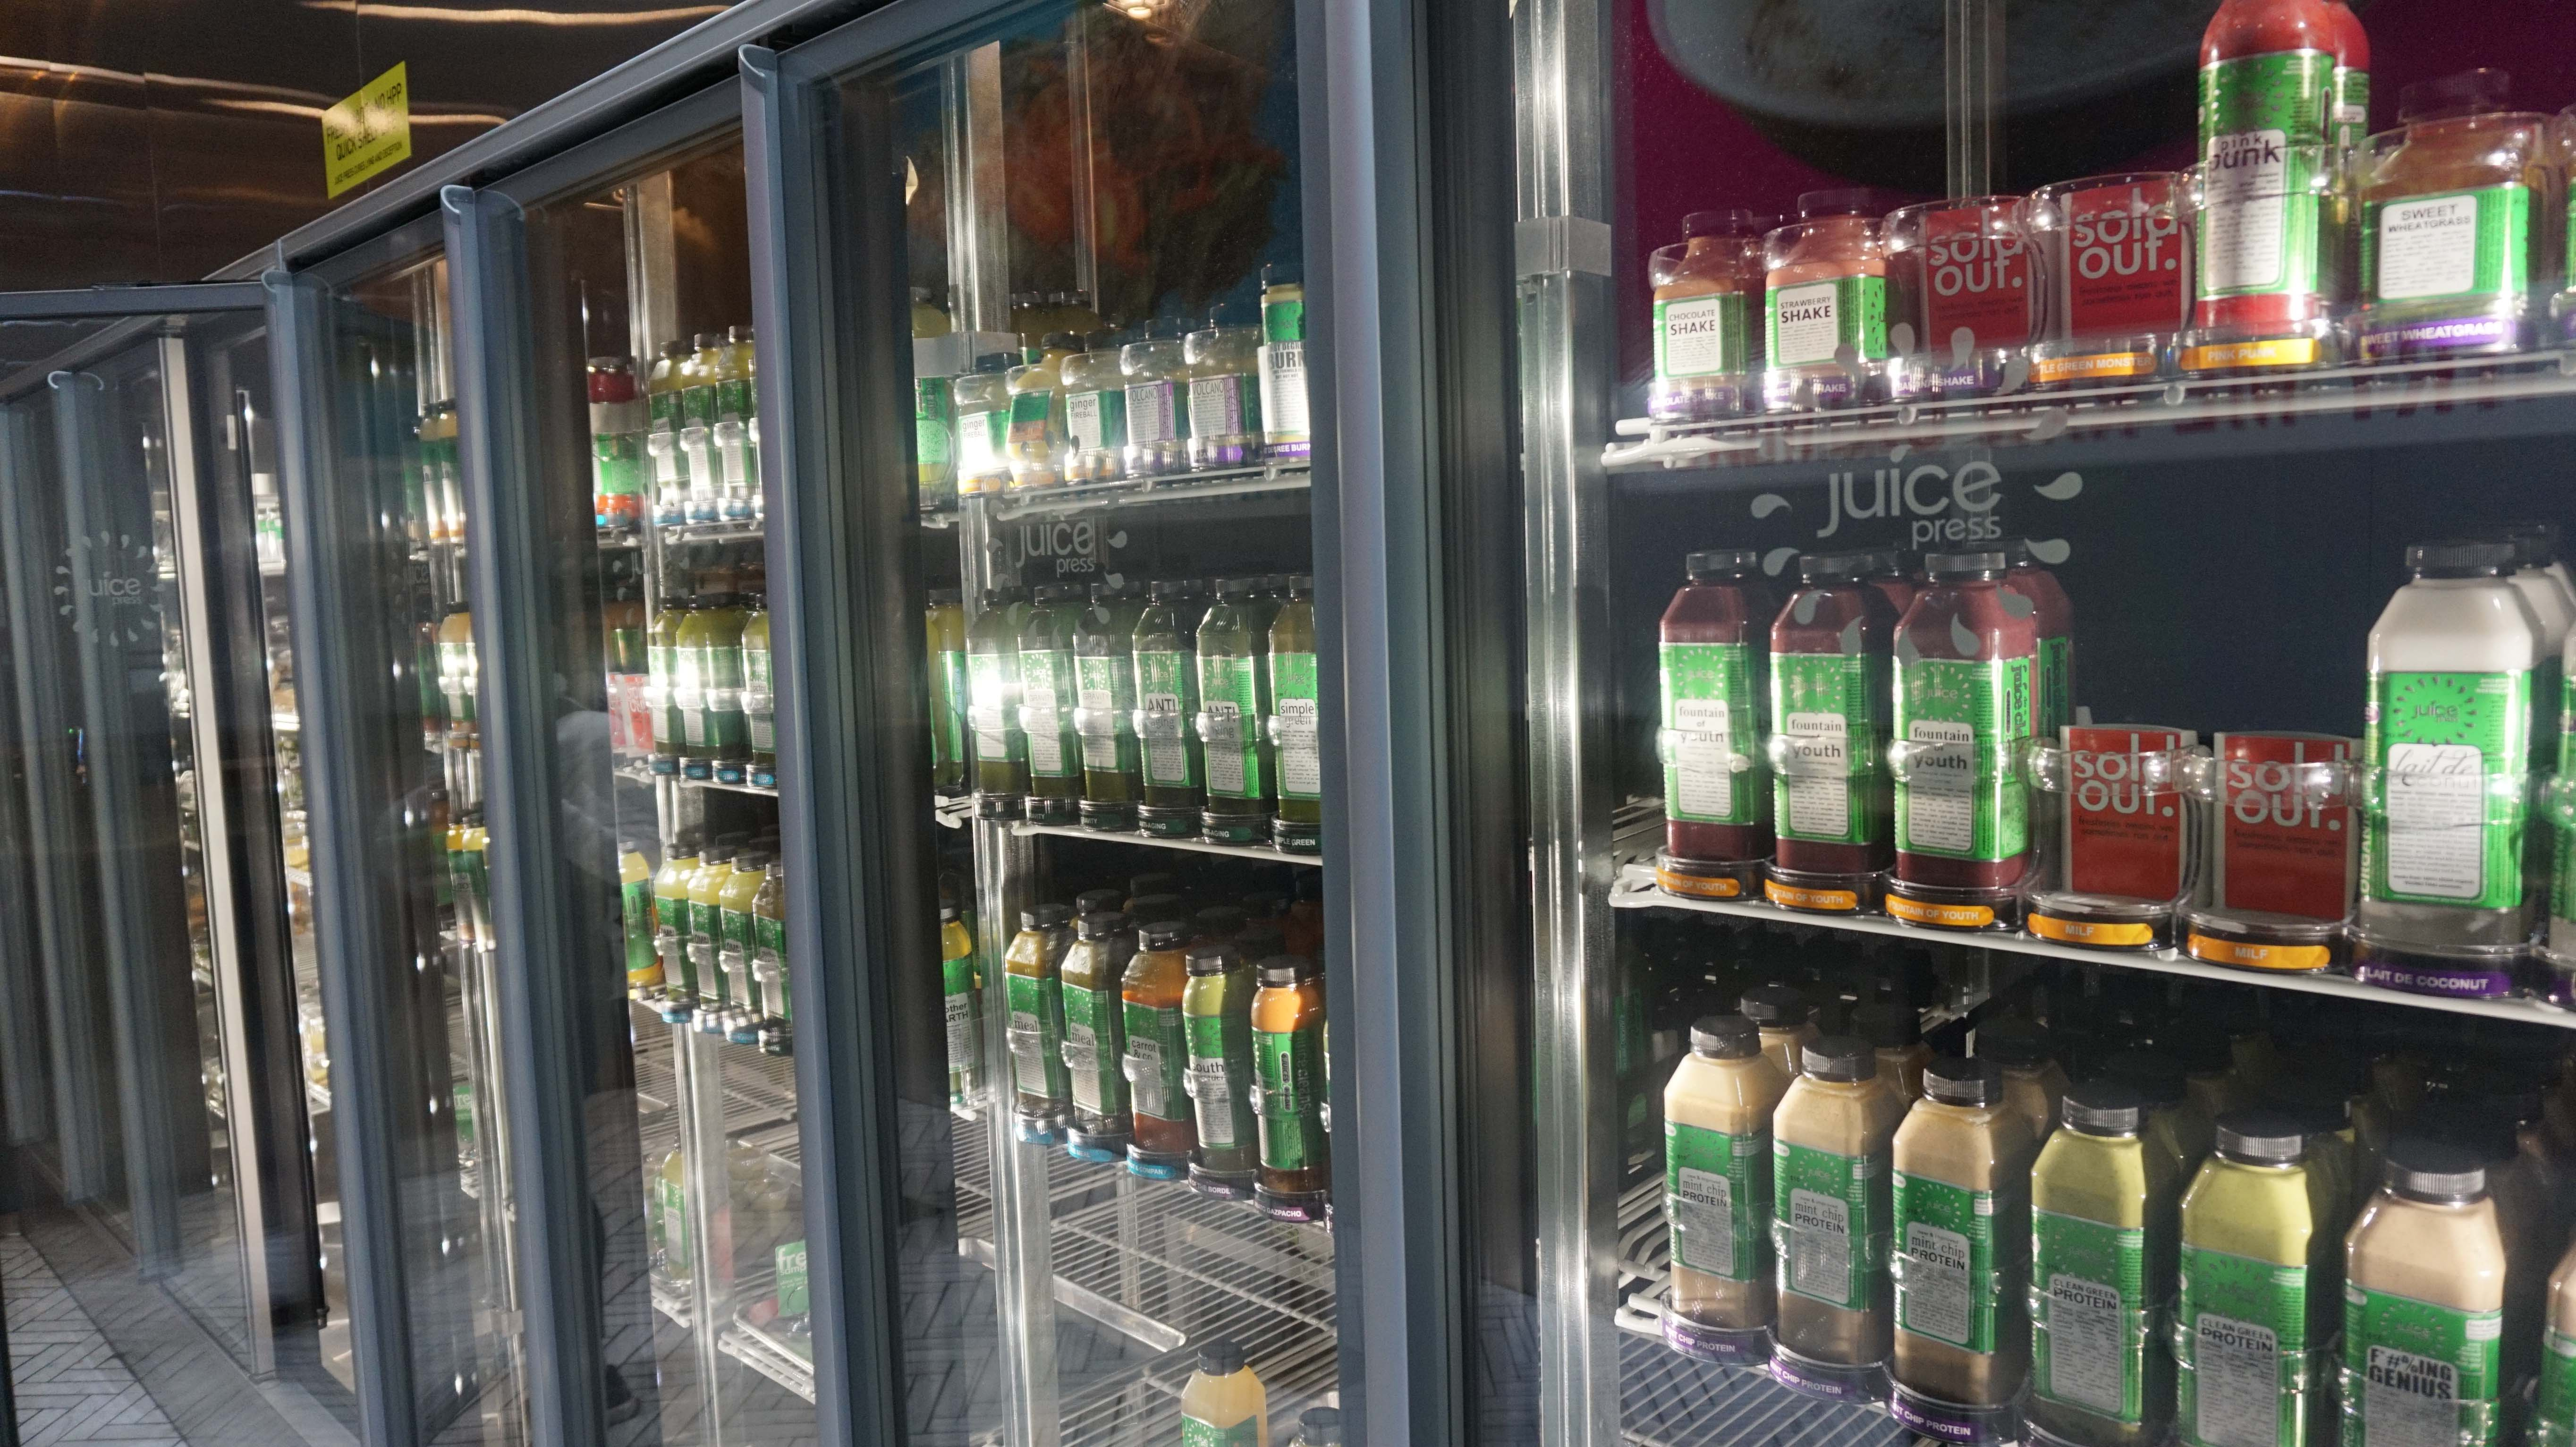 Organic juice frig